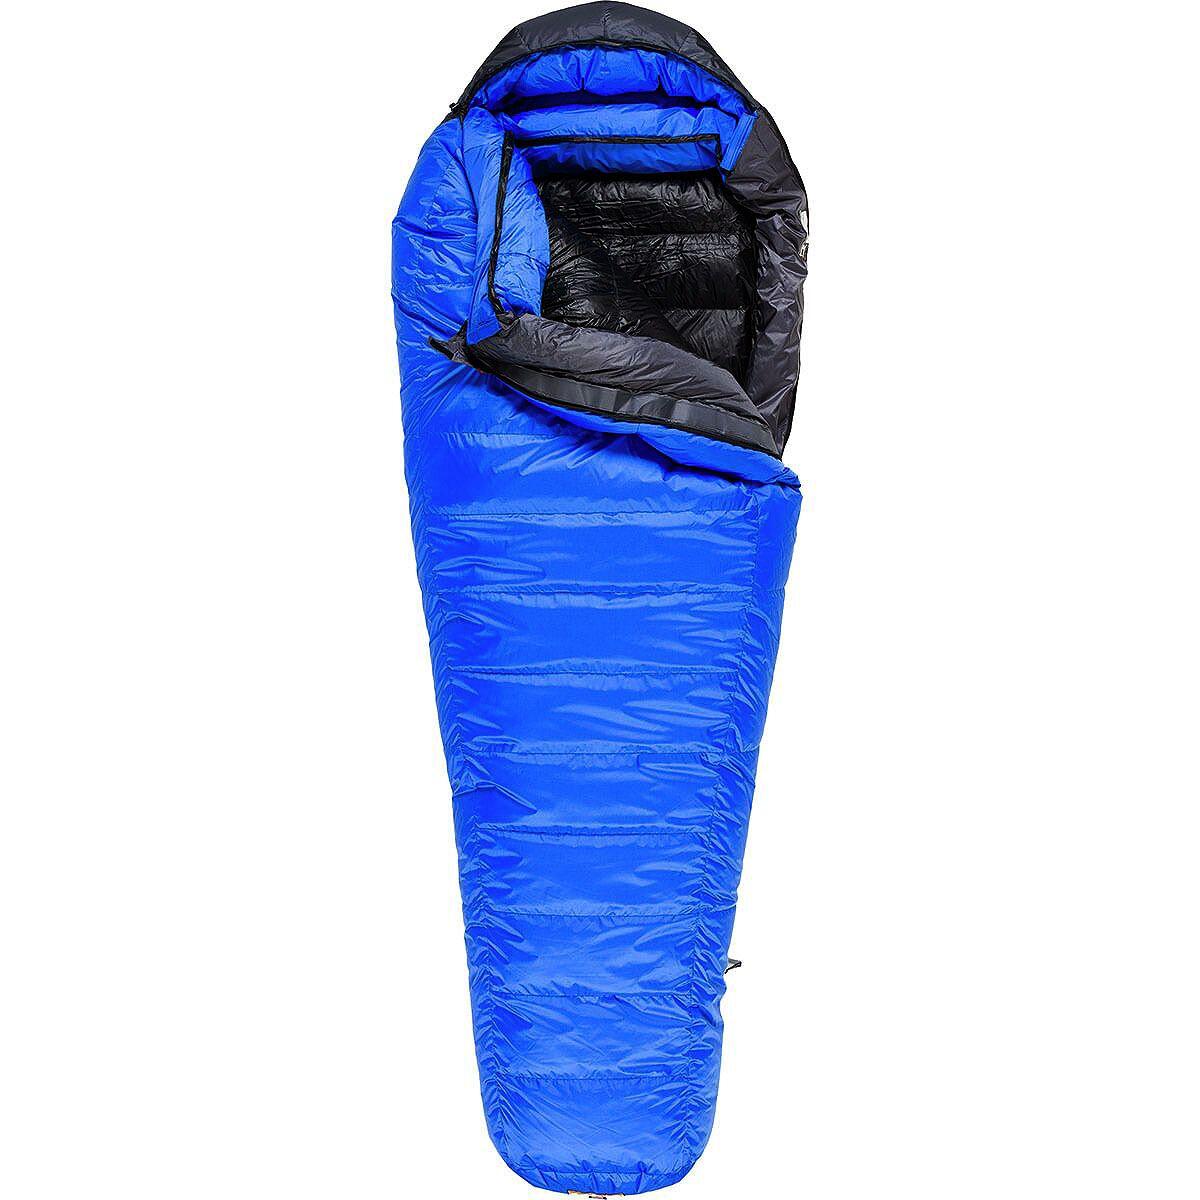 Western Mountaineering Puma Gore WS Sleeping Bag: -25 Degree Down Royal Blue, 5ft 6in/Left Zip